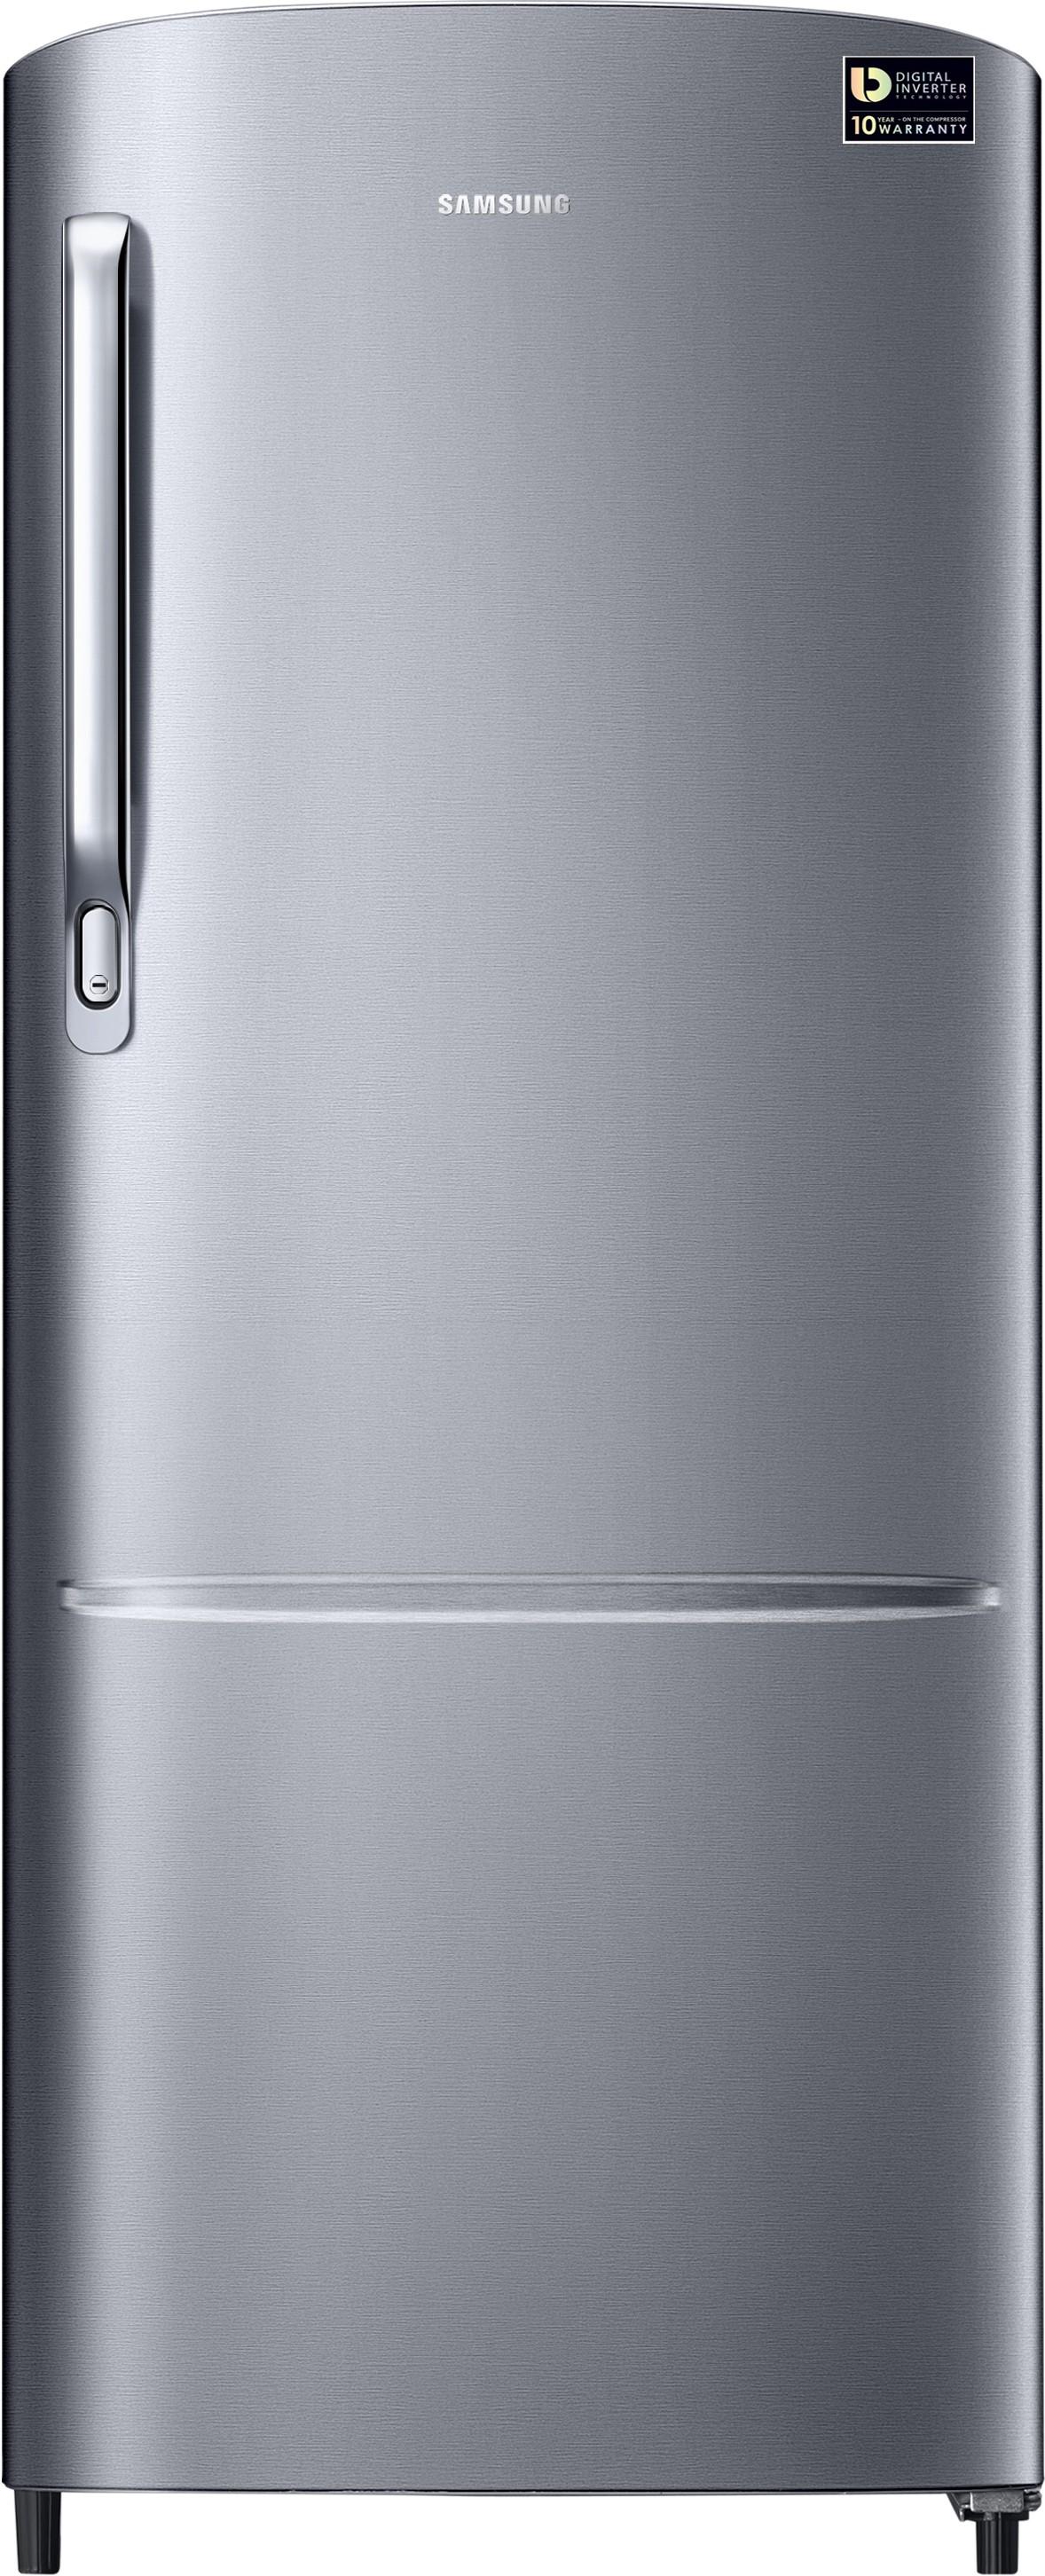 Samsung 212 L Direct Cool Single Door Refrigerator(RR22M272ZS8/NL, Elegant Inox, 2017)   Refrigerator  (Samsung)